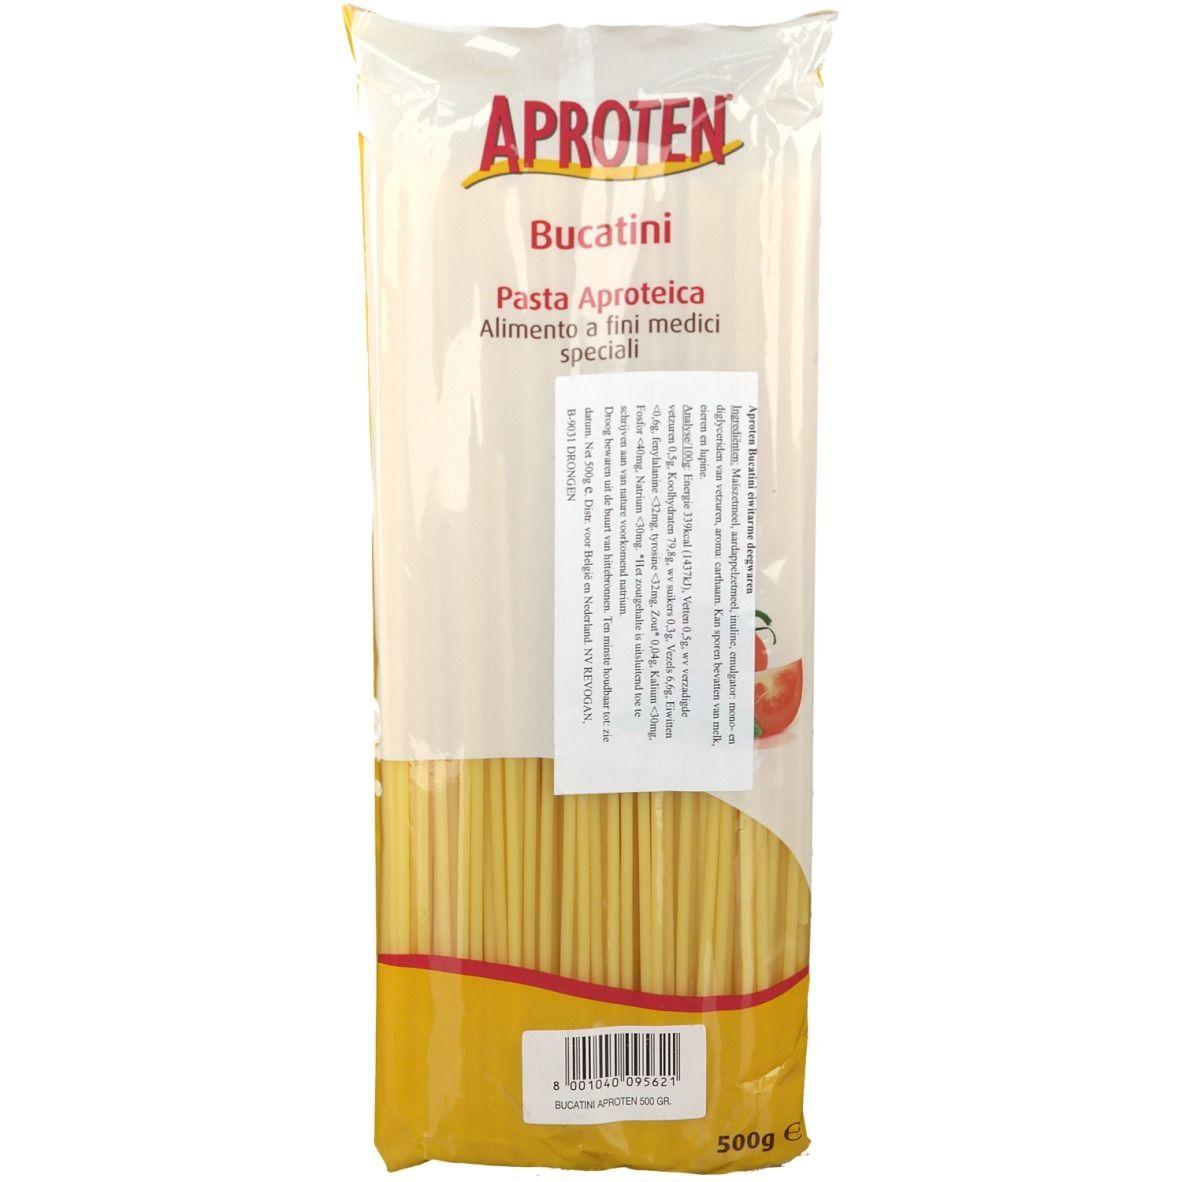 Image of APROTEN® Bucatini eiweißarme Pasta